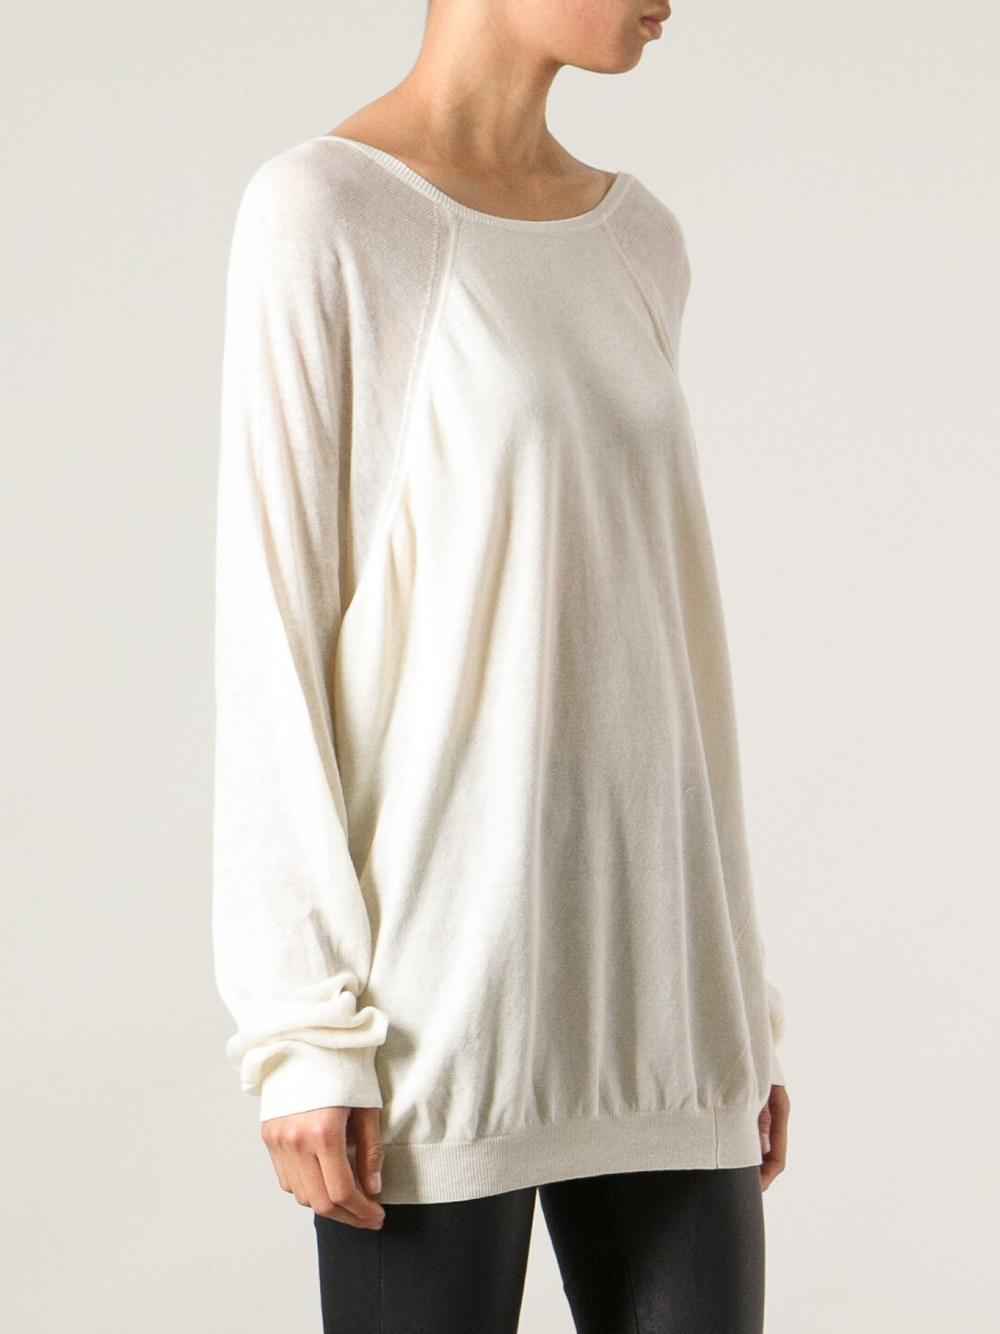 haider ackermann low vneck back sweater in natural lyst. Black Bedroom Furniture Sets. Home Design Ideas